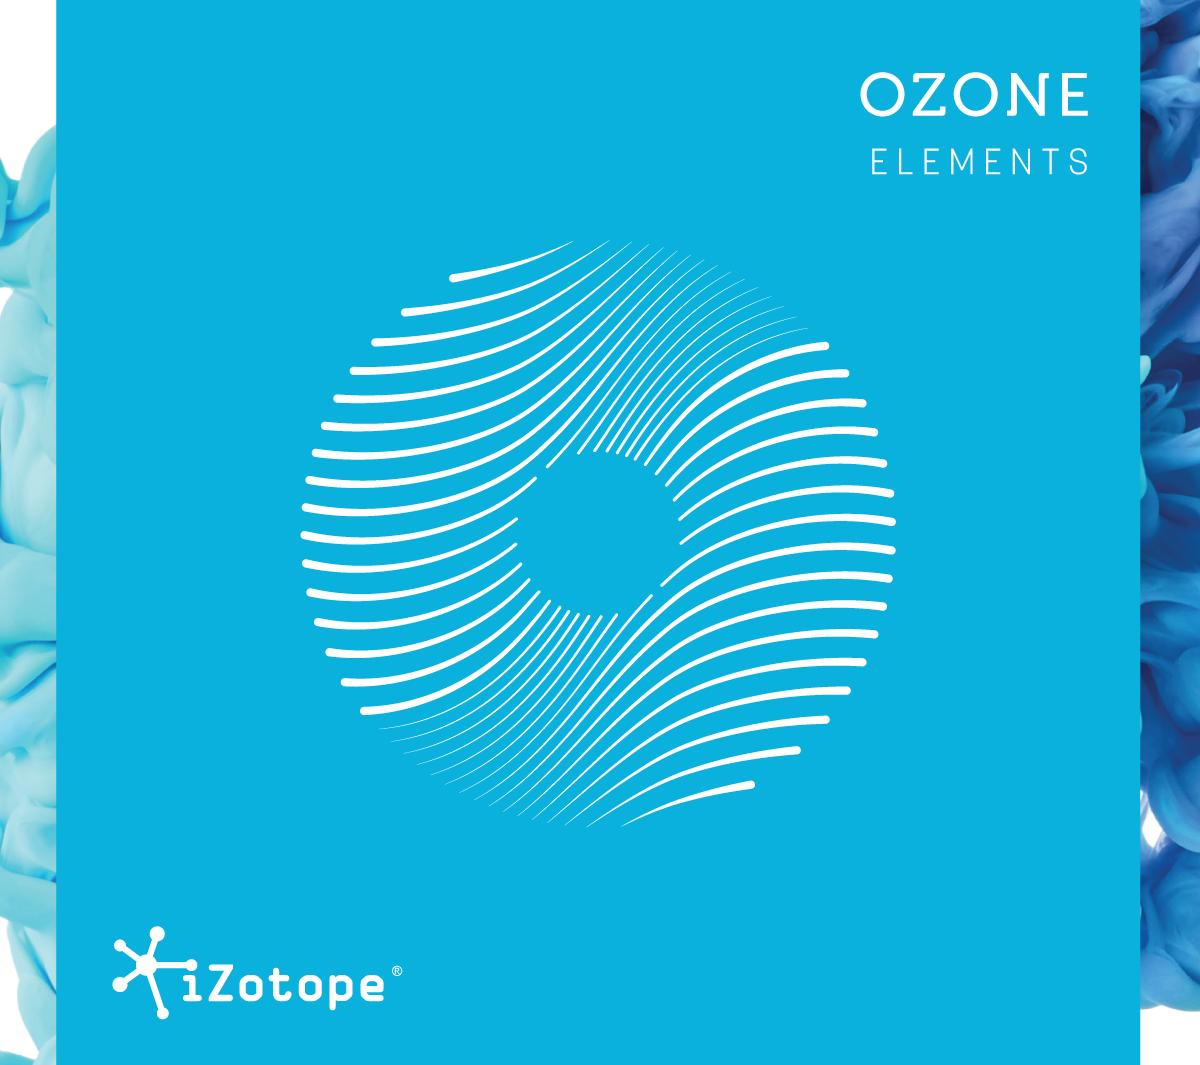 Ozone Elements: Mastering Plug-in, iZotope [Online Code]